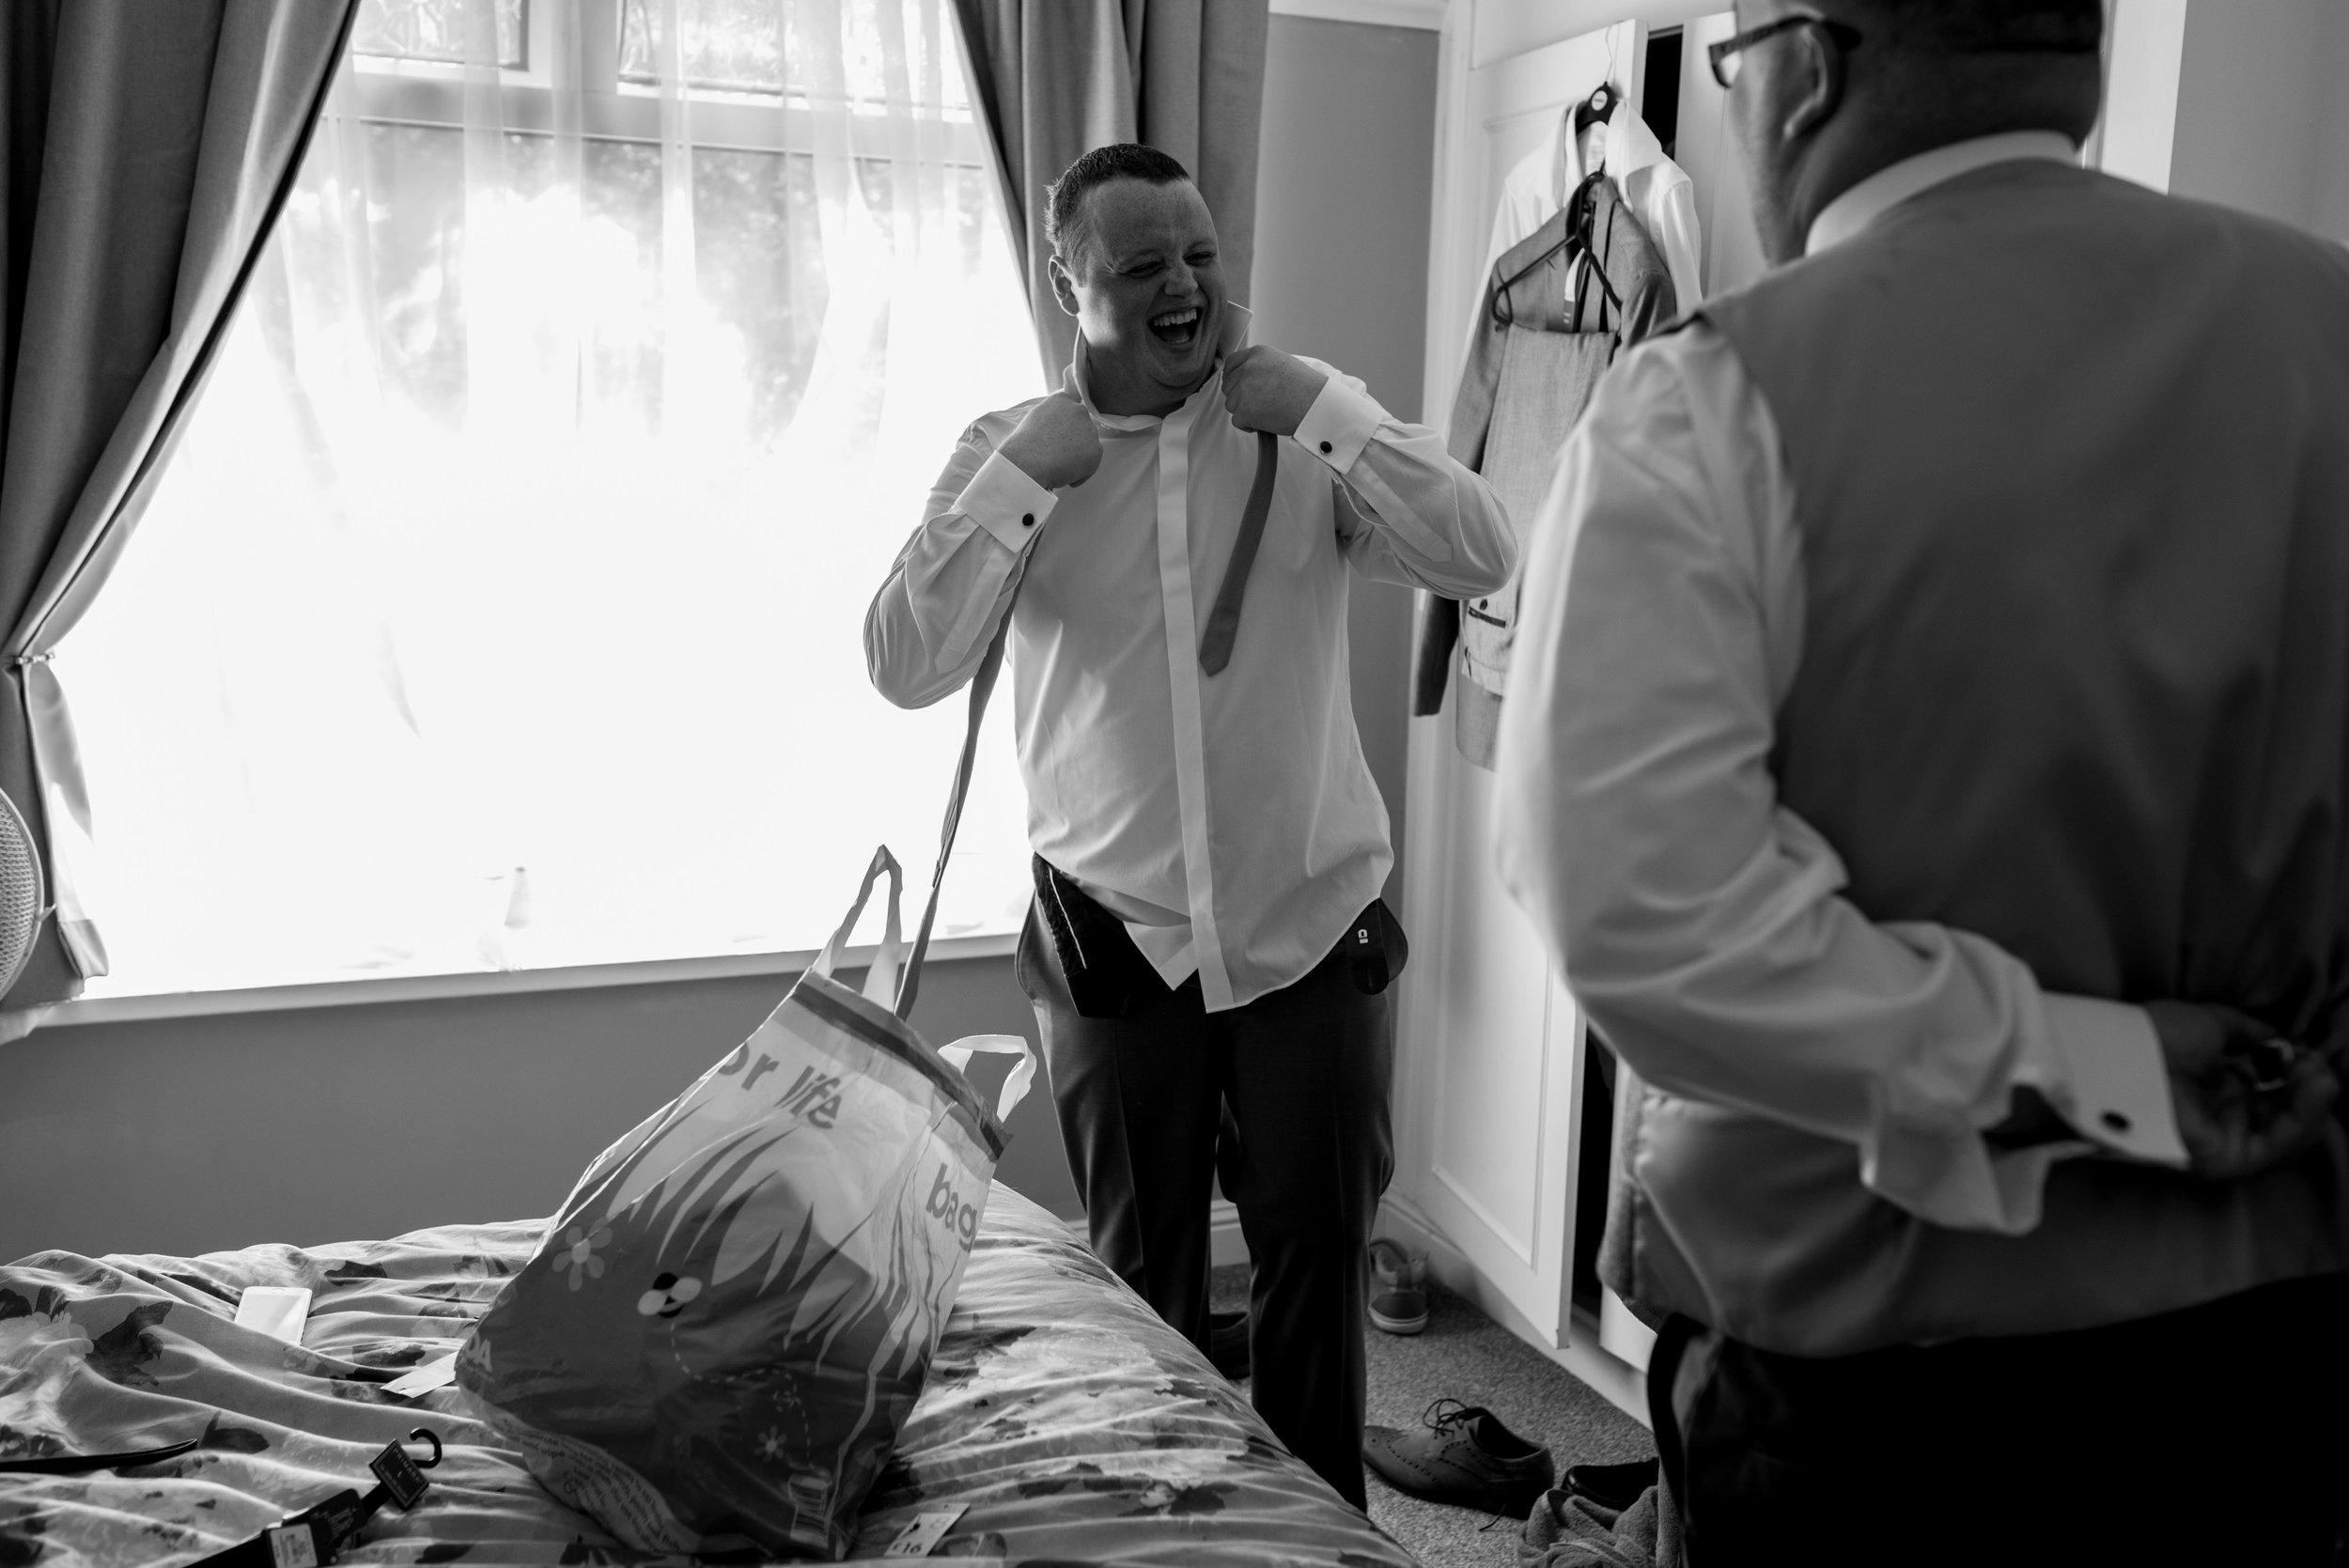 Groom ties his tie while laughing towards the best man.